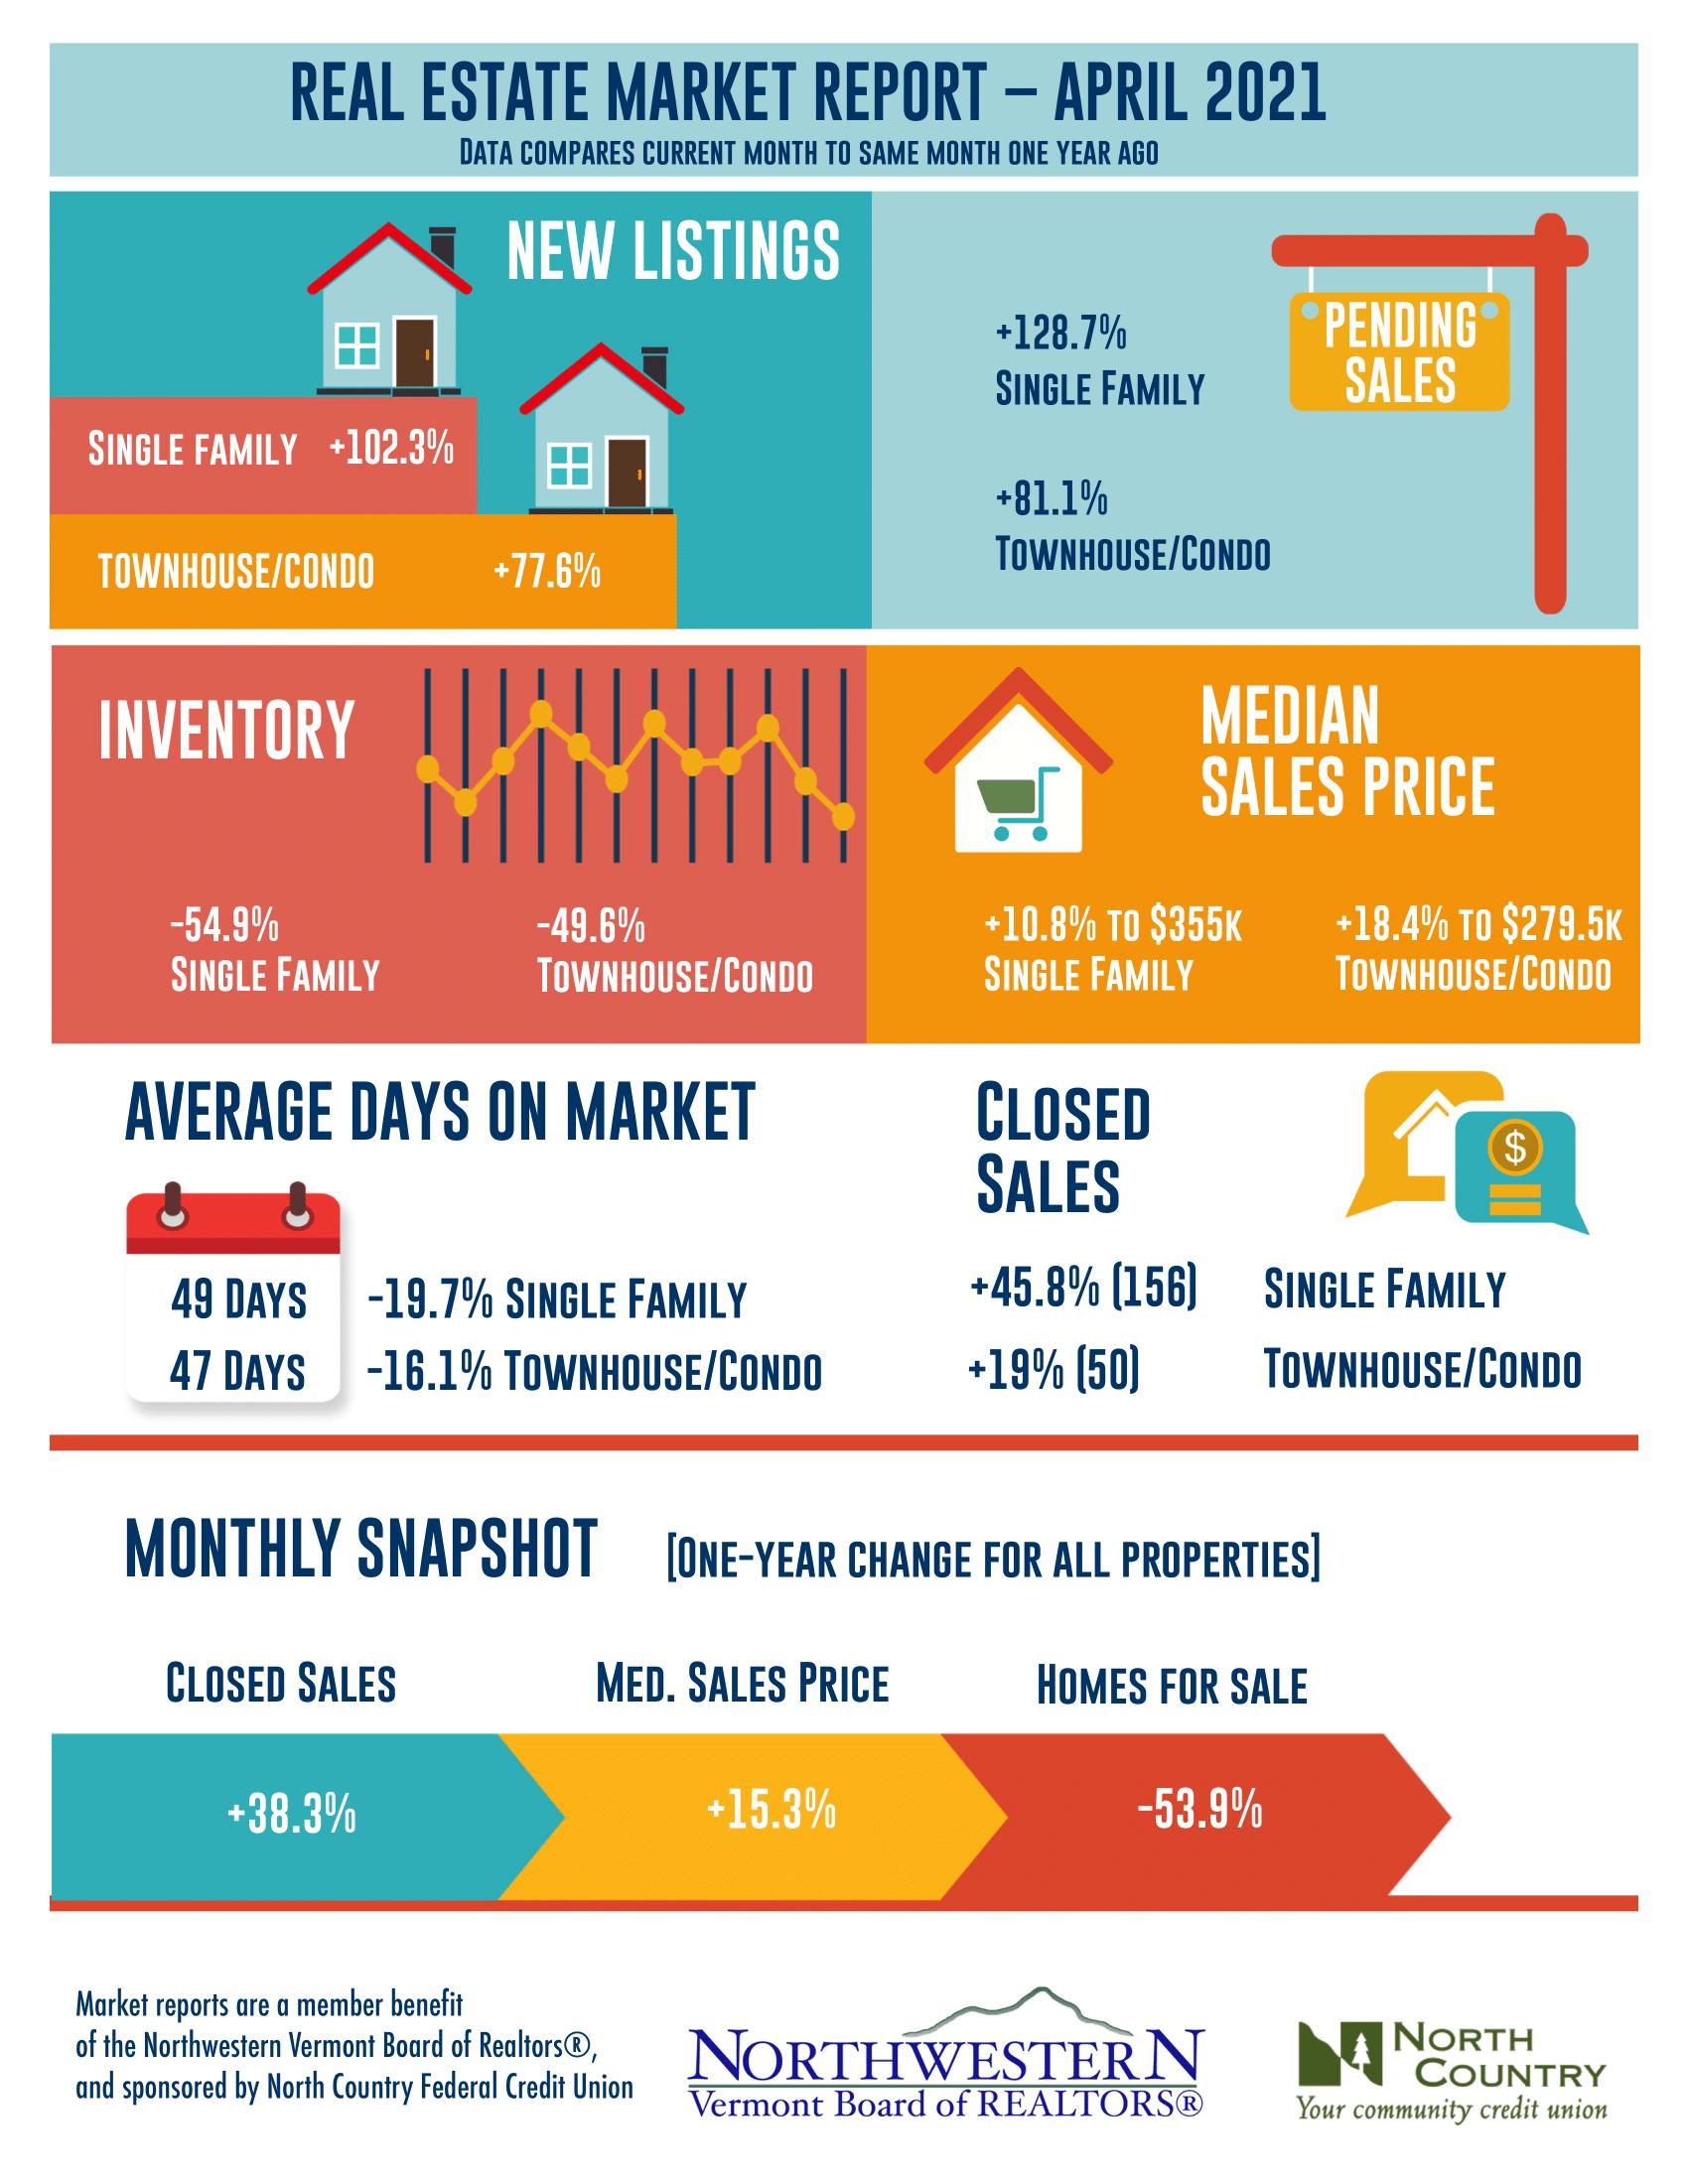 Vermont Real Estate Market Report: April 2021